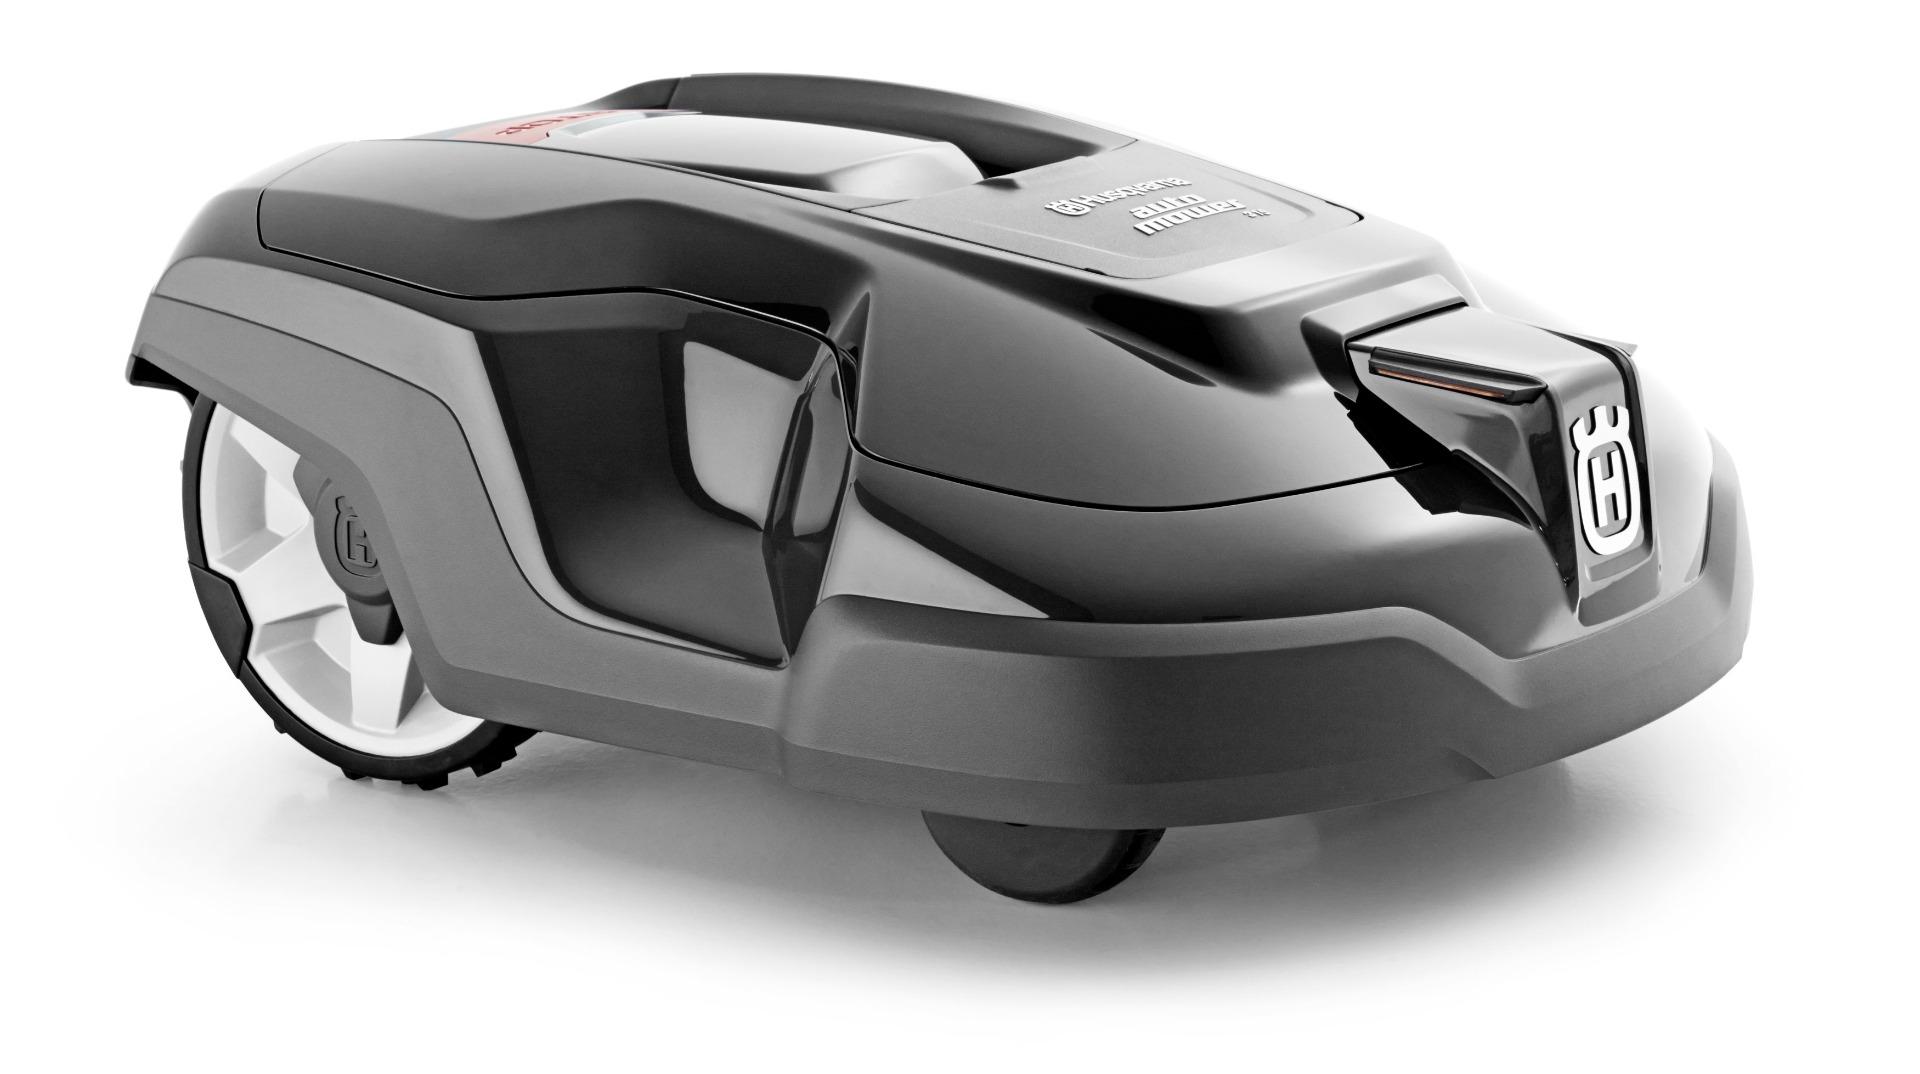 achat vente tondeuse robot p o s val d oise 95. Black Bedroom Furniture Sets. Home Design Ideas